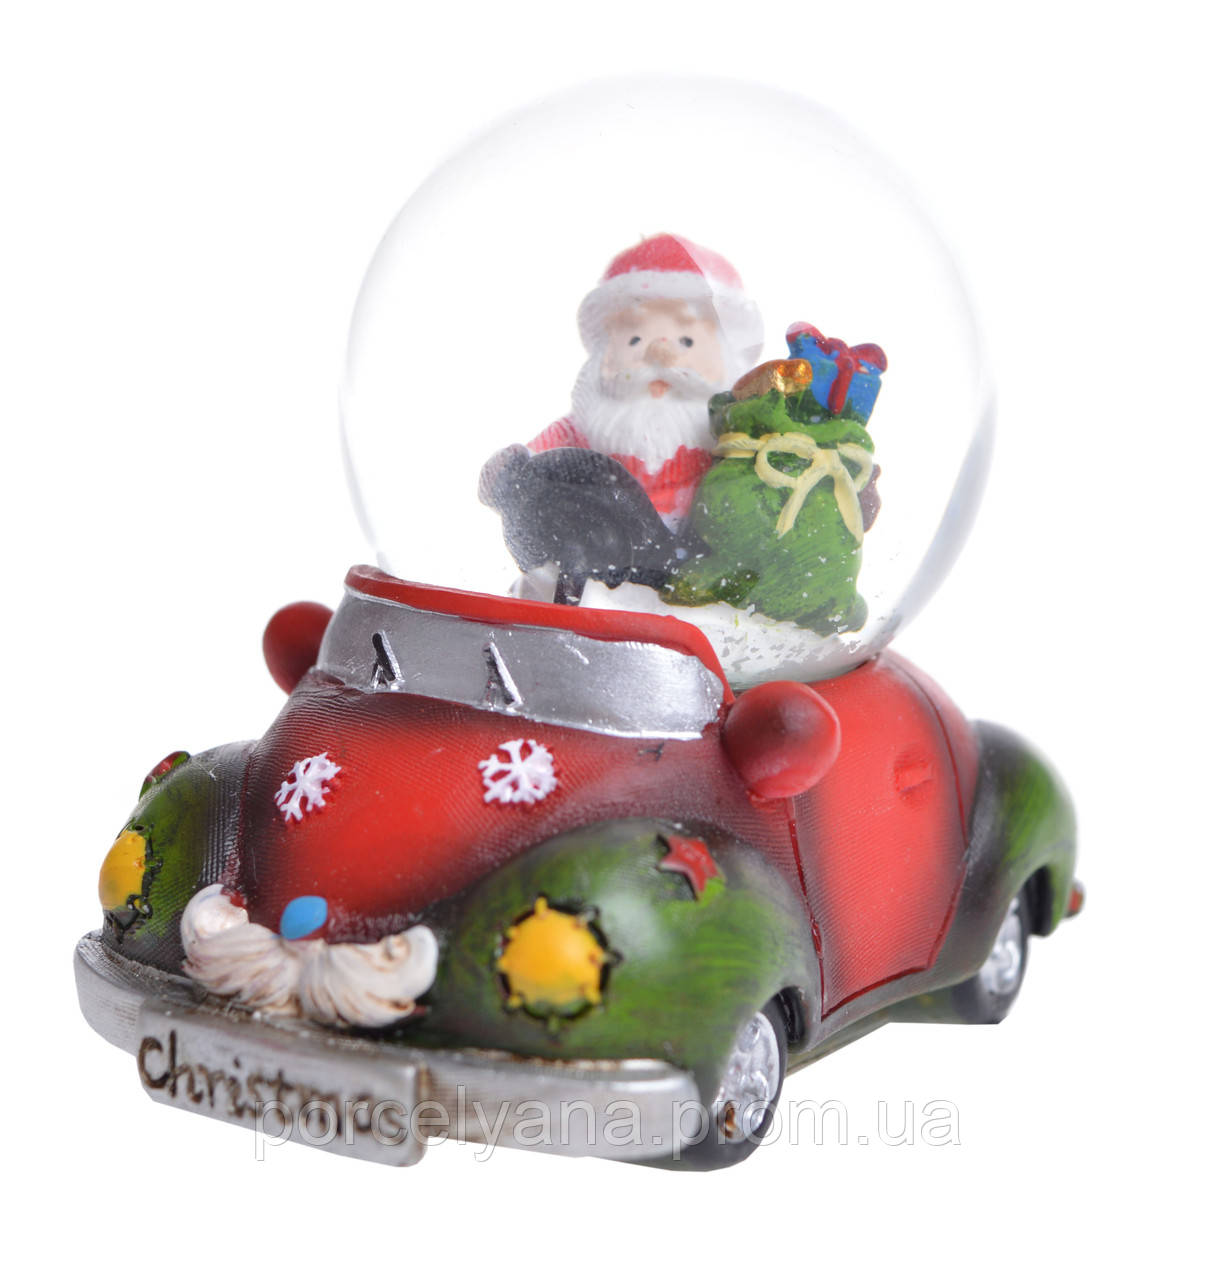 Снежный шар Санта на машине 6 см